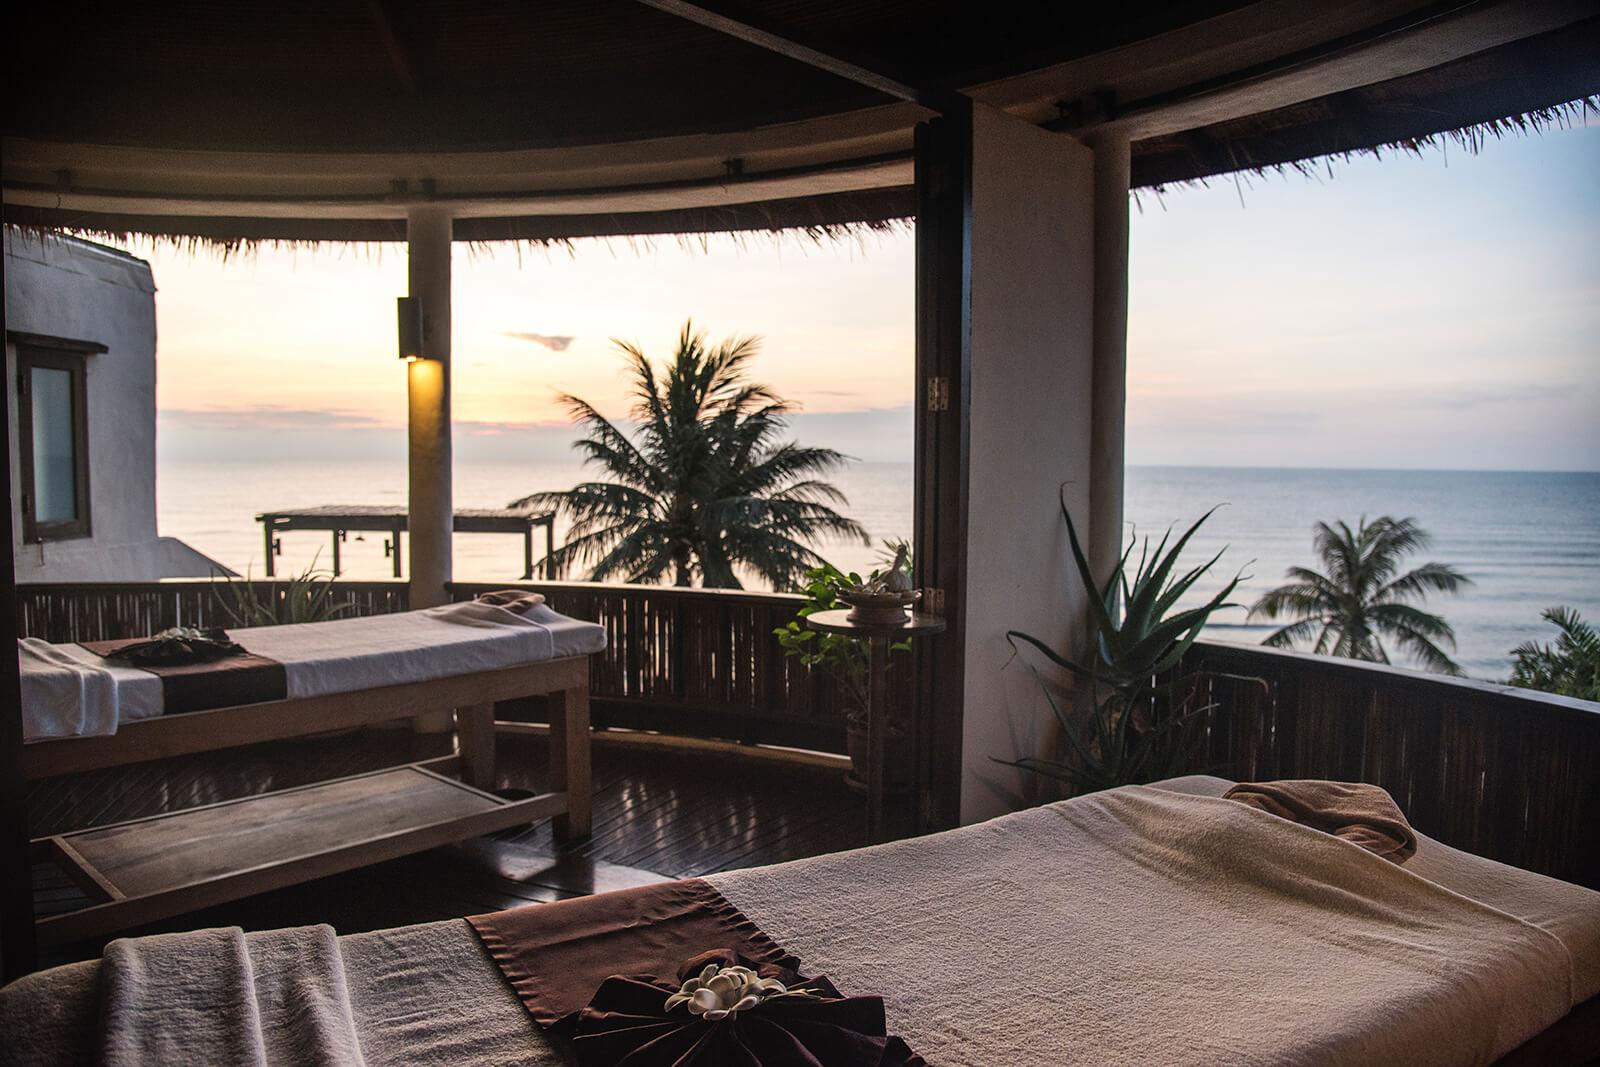 Luxury spa on the beach